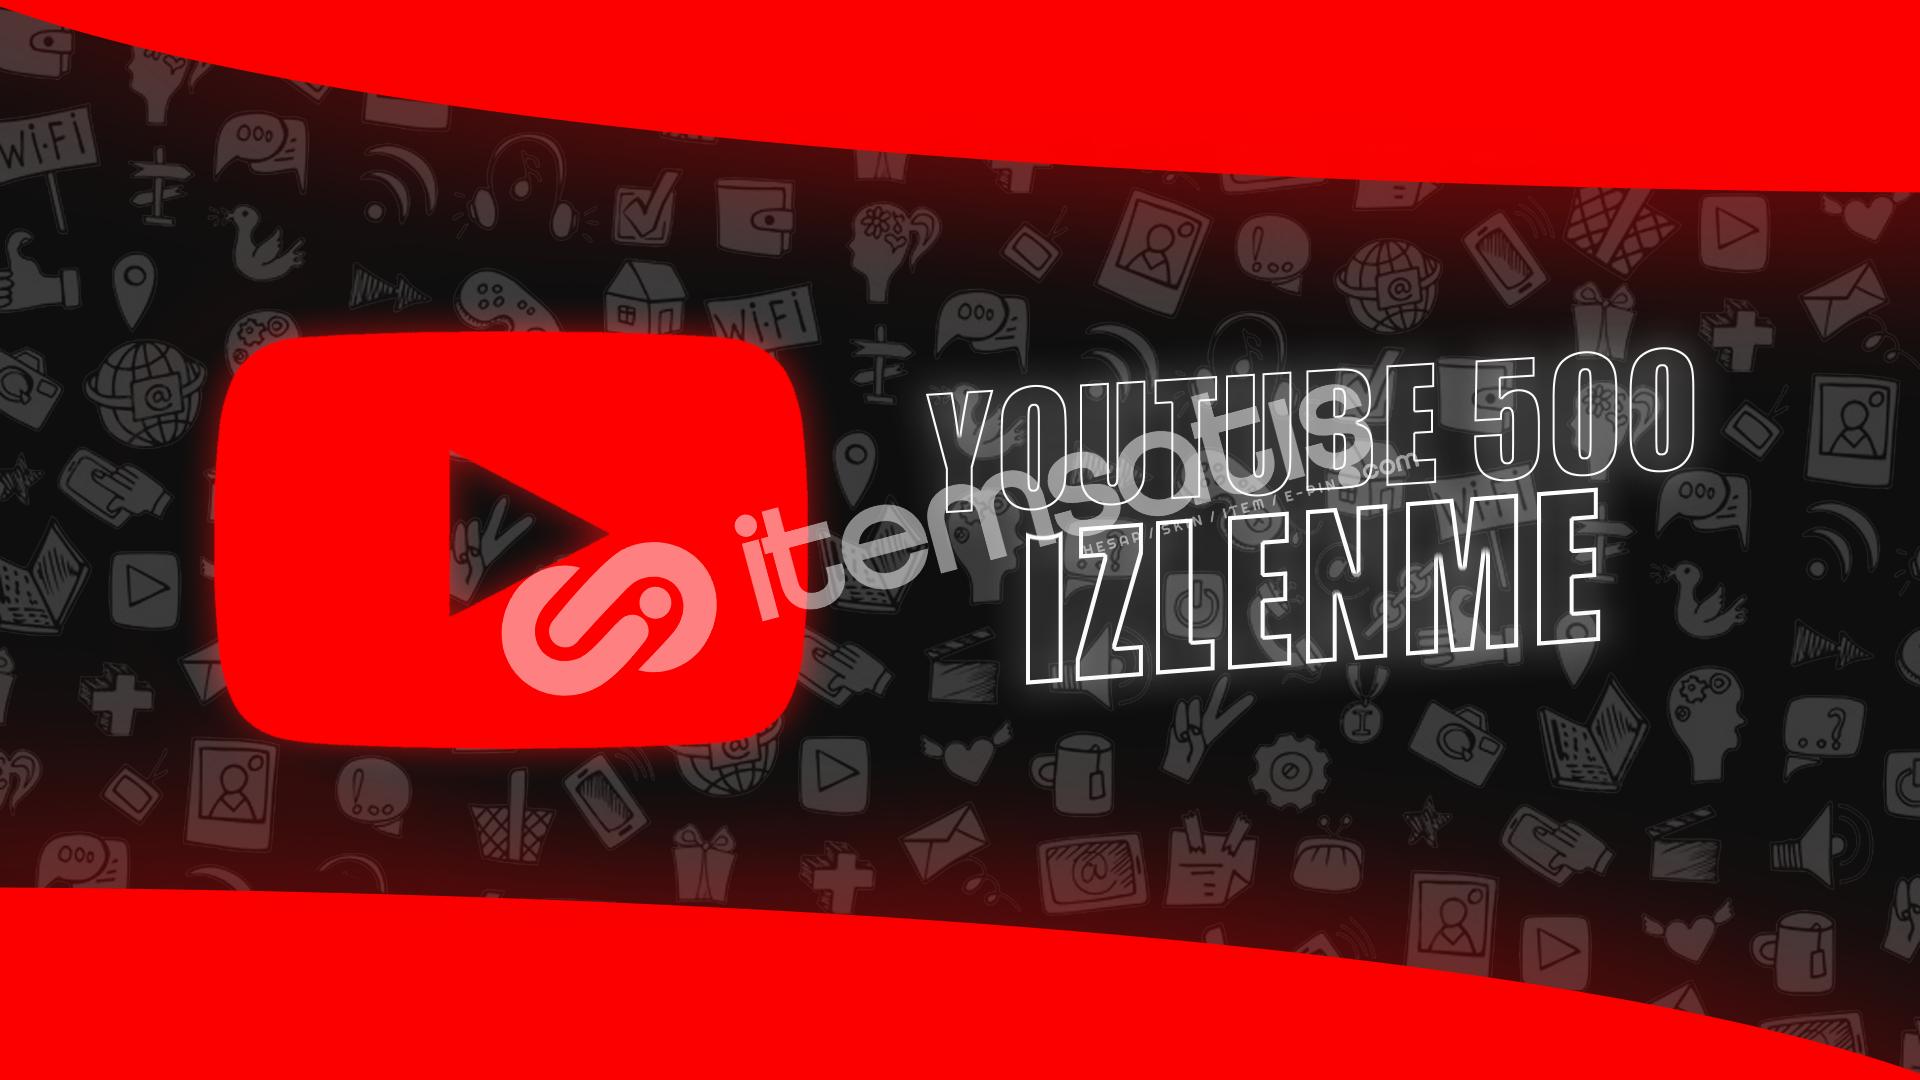 Çalışan Tek Servis - YouTube 500 İzlenme - 3TL